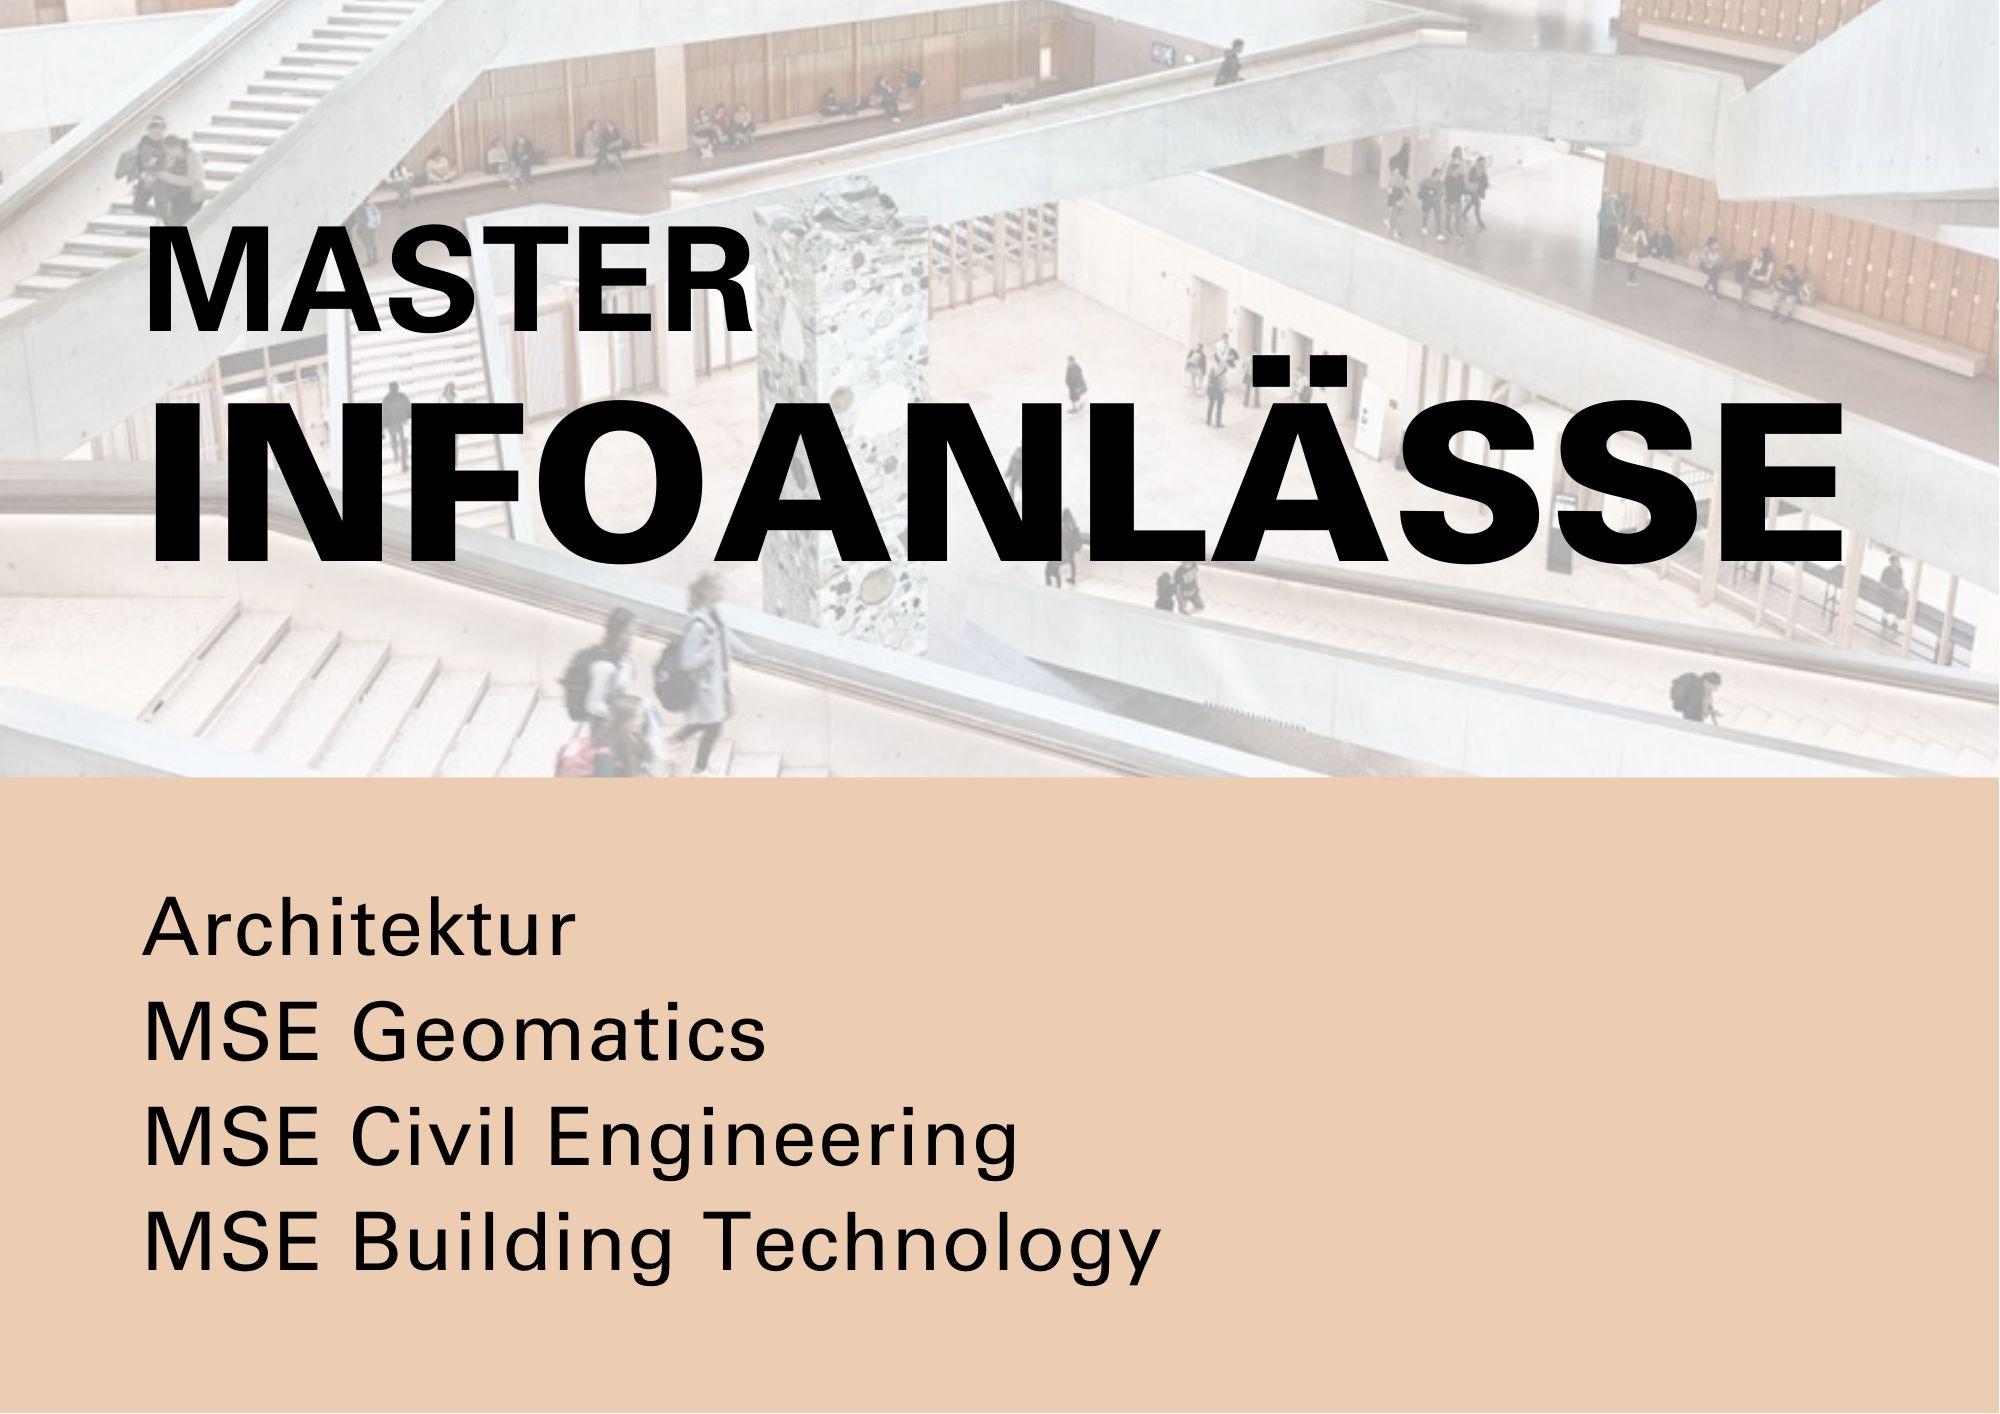 Infoanlass Master Architektur Bau Geomatik